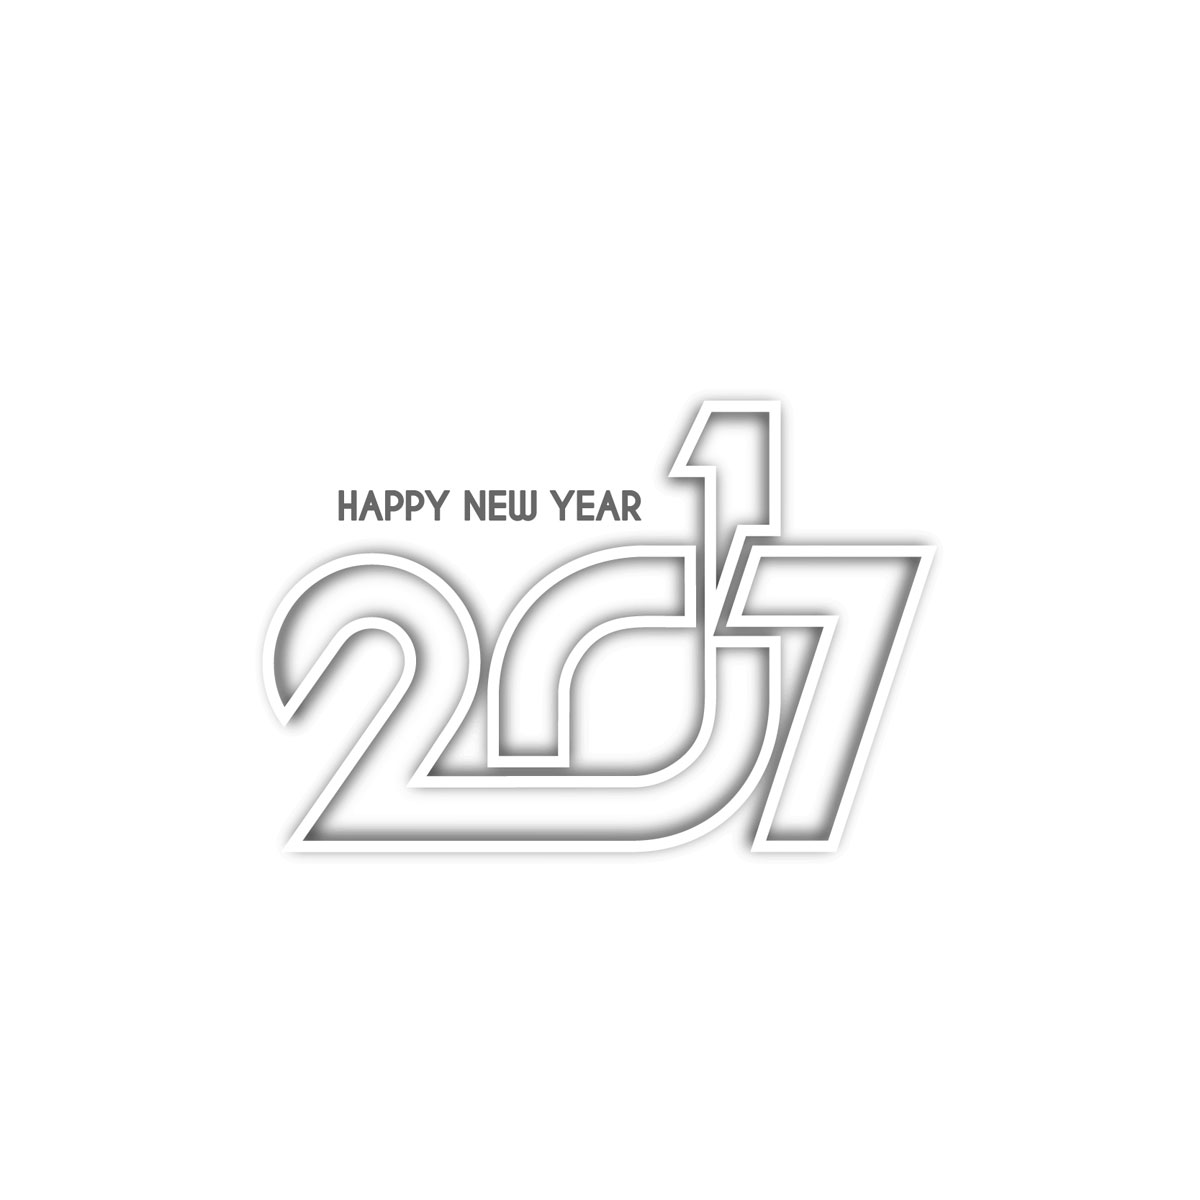 Happy New Year 2017 Wishes For BoyFriend In English